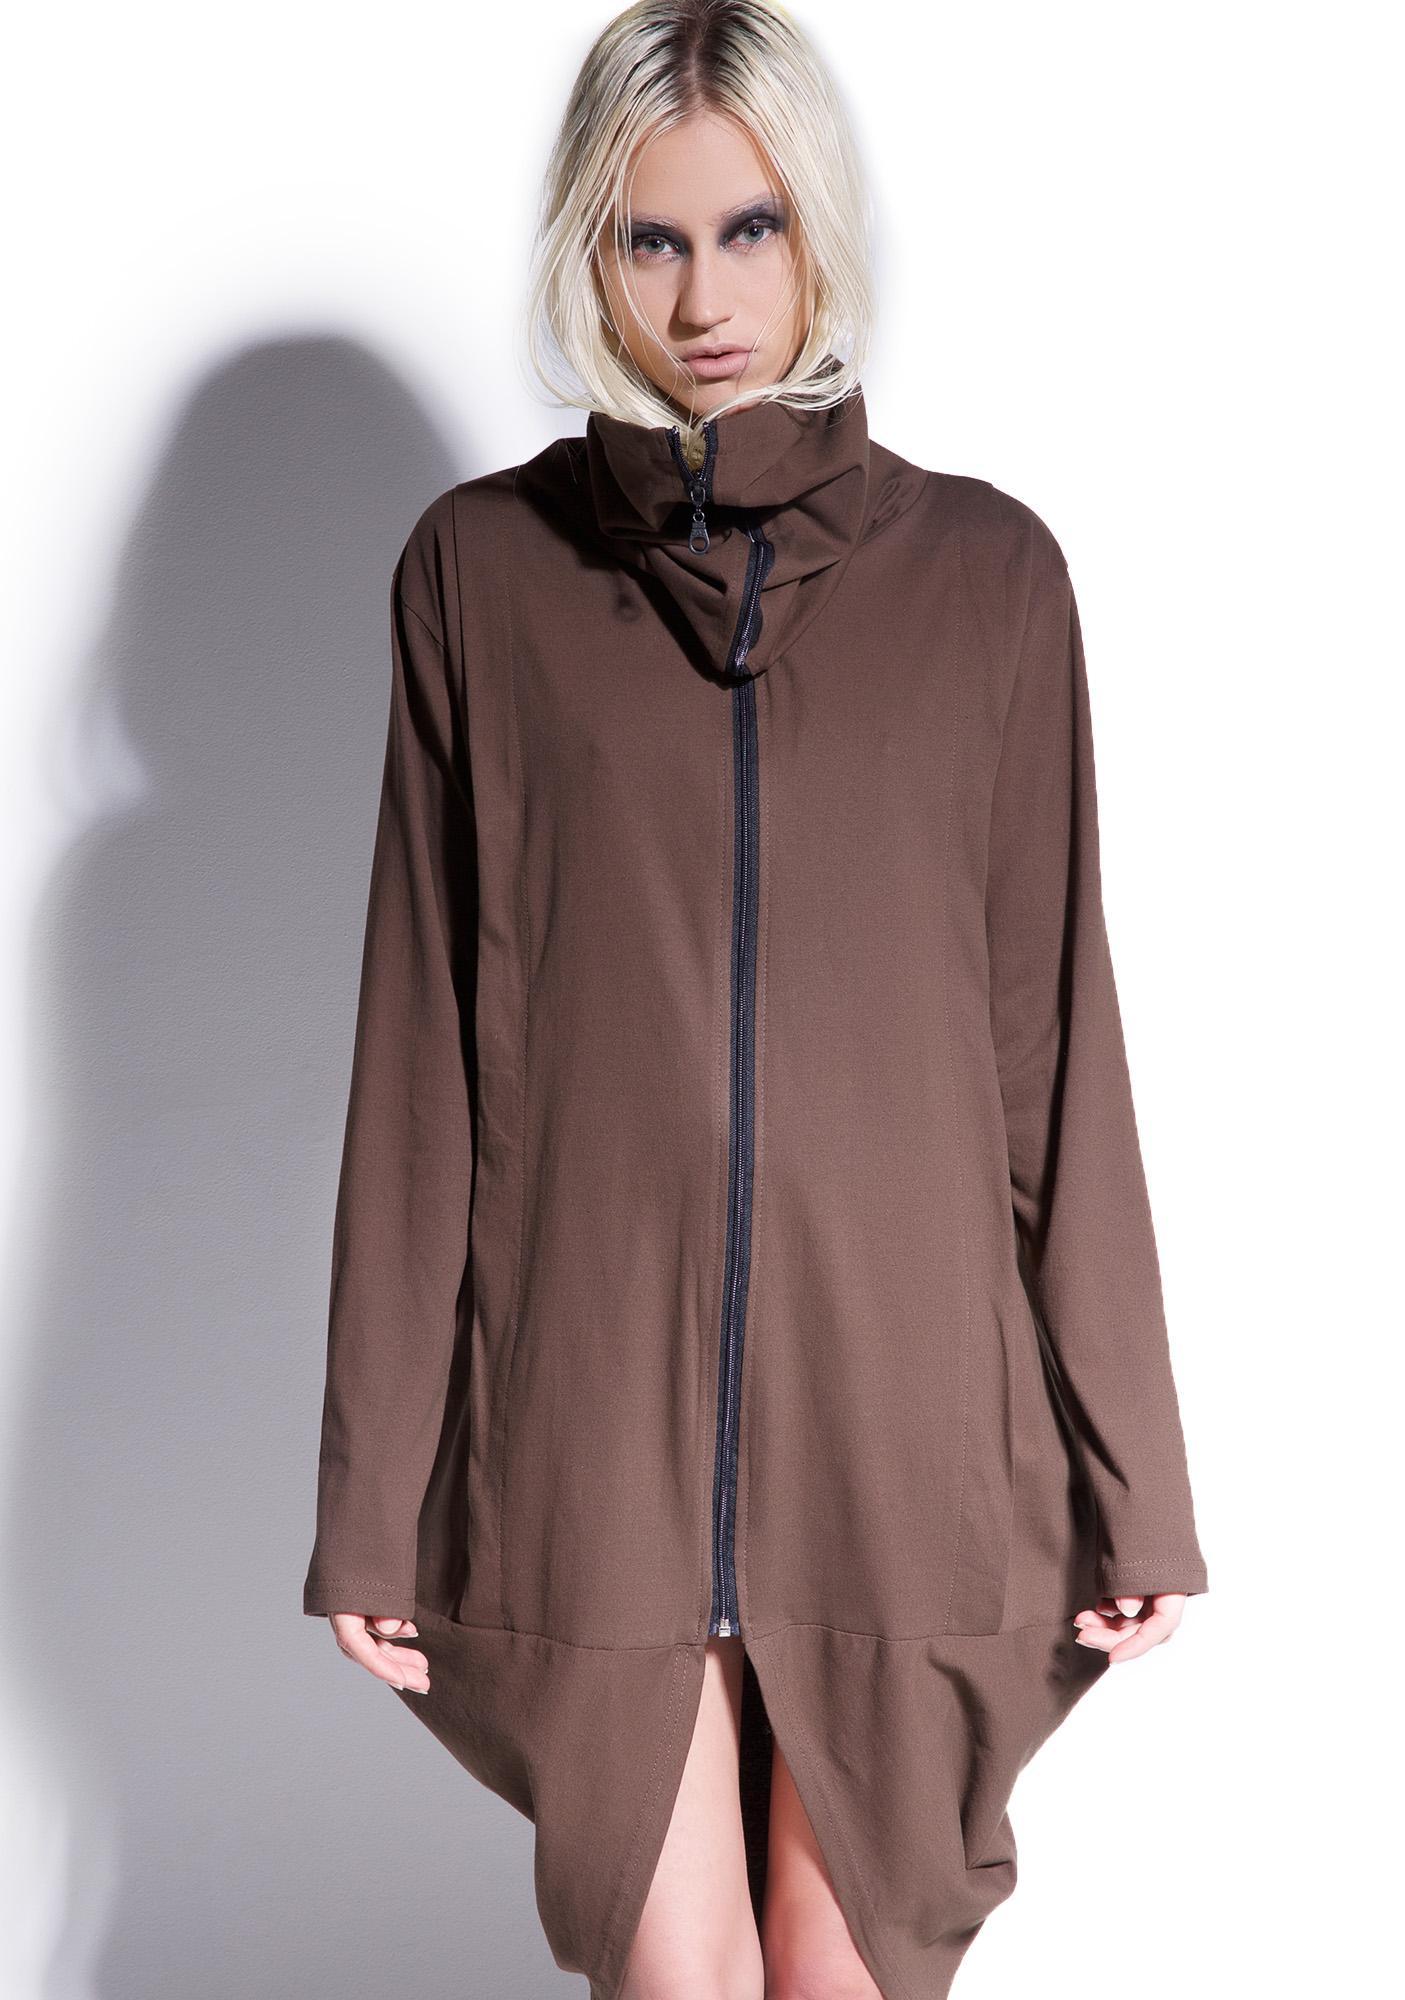 MNML Umber Indefinite Jacket